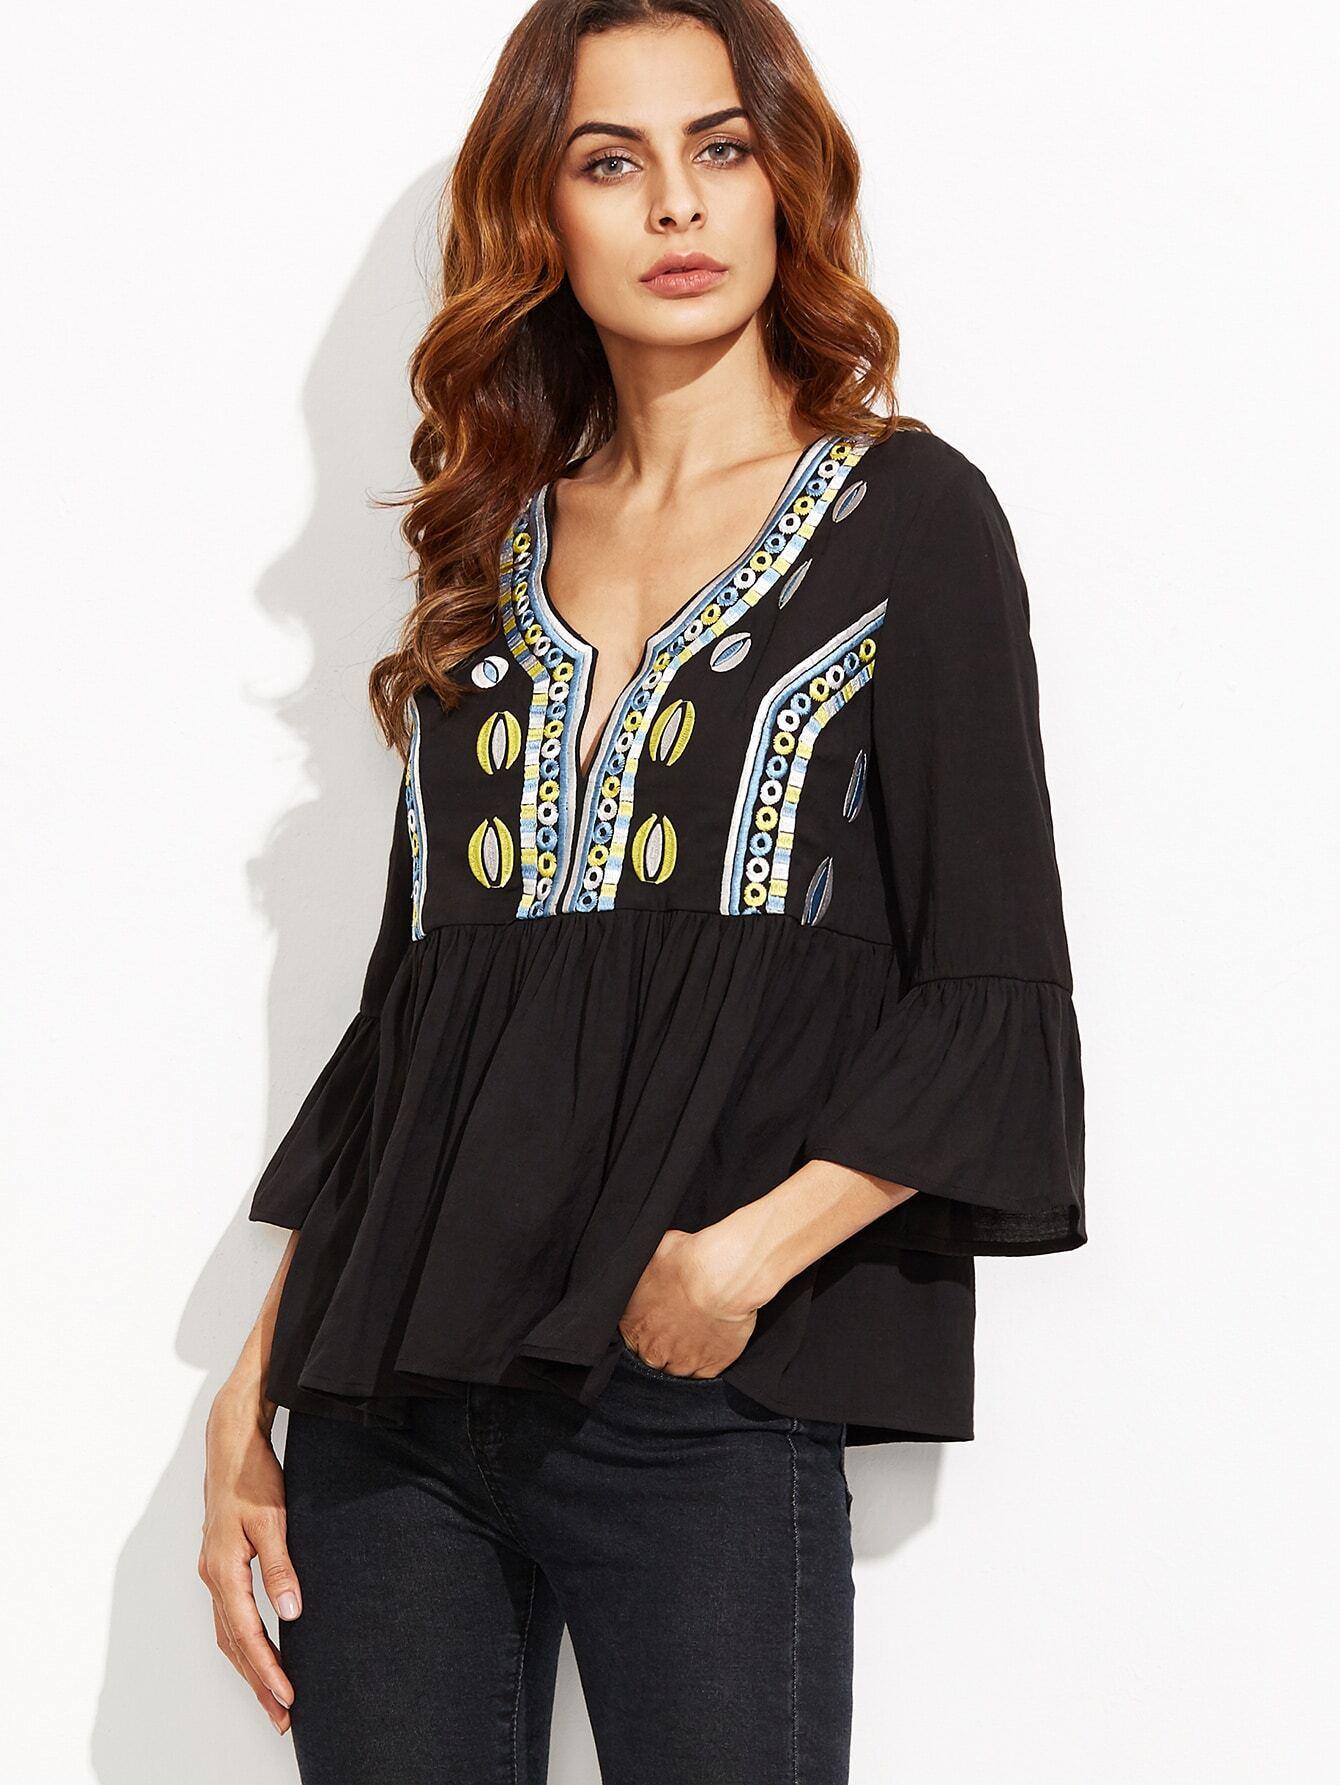 blouse160908702_2